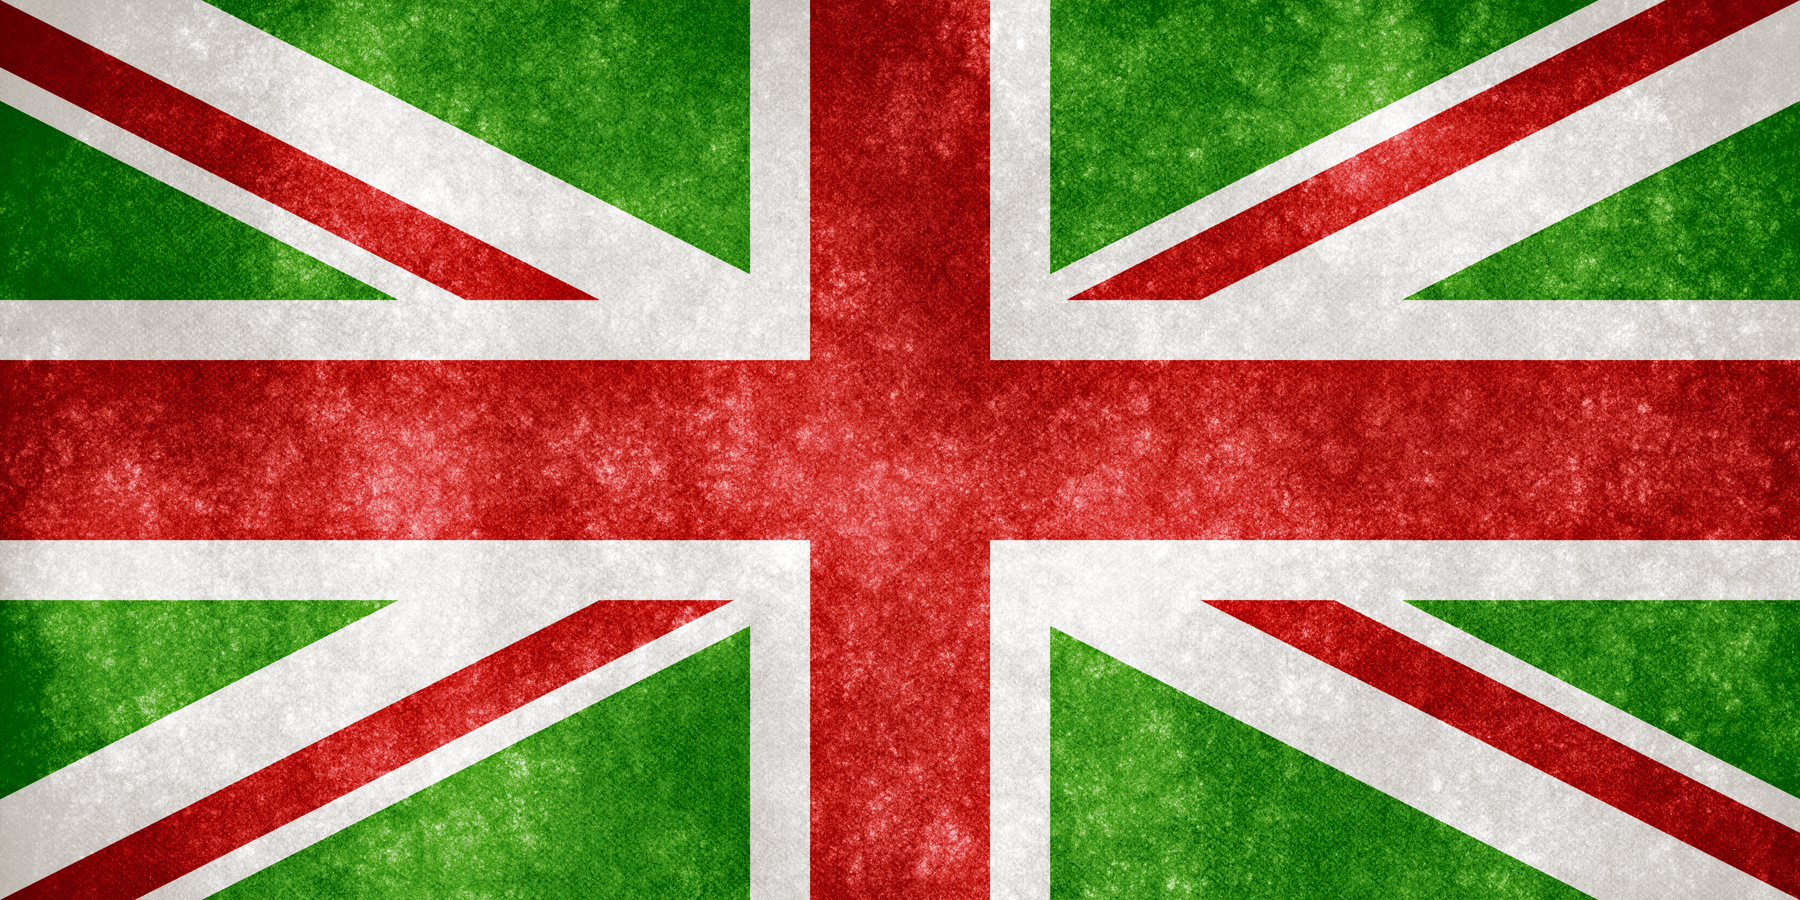 UK Grunge Flag - Christmas Colors, Age, Page, Season, Retro, HQ Photo